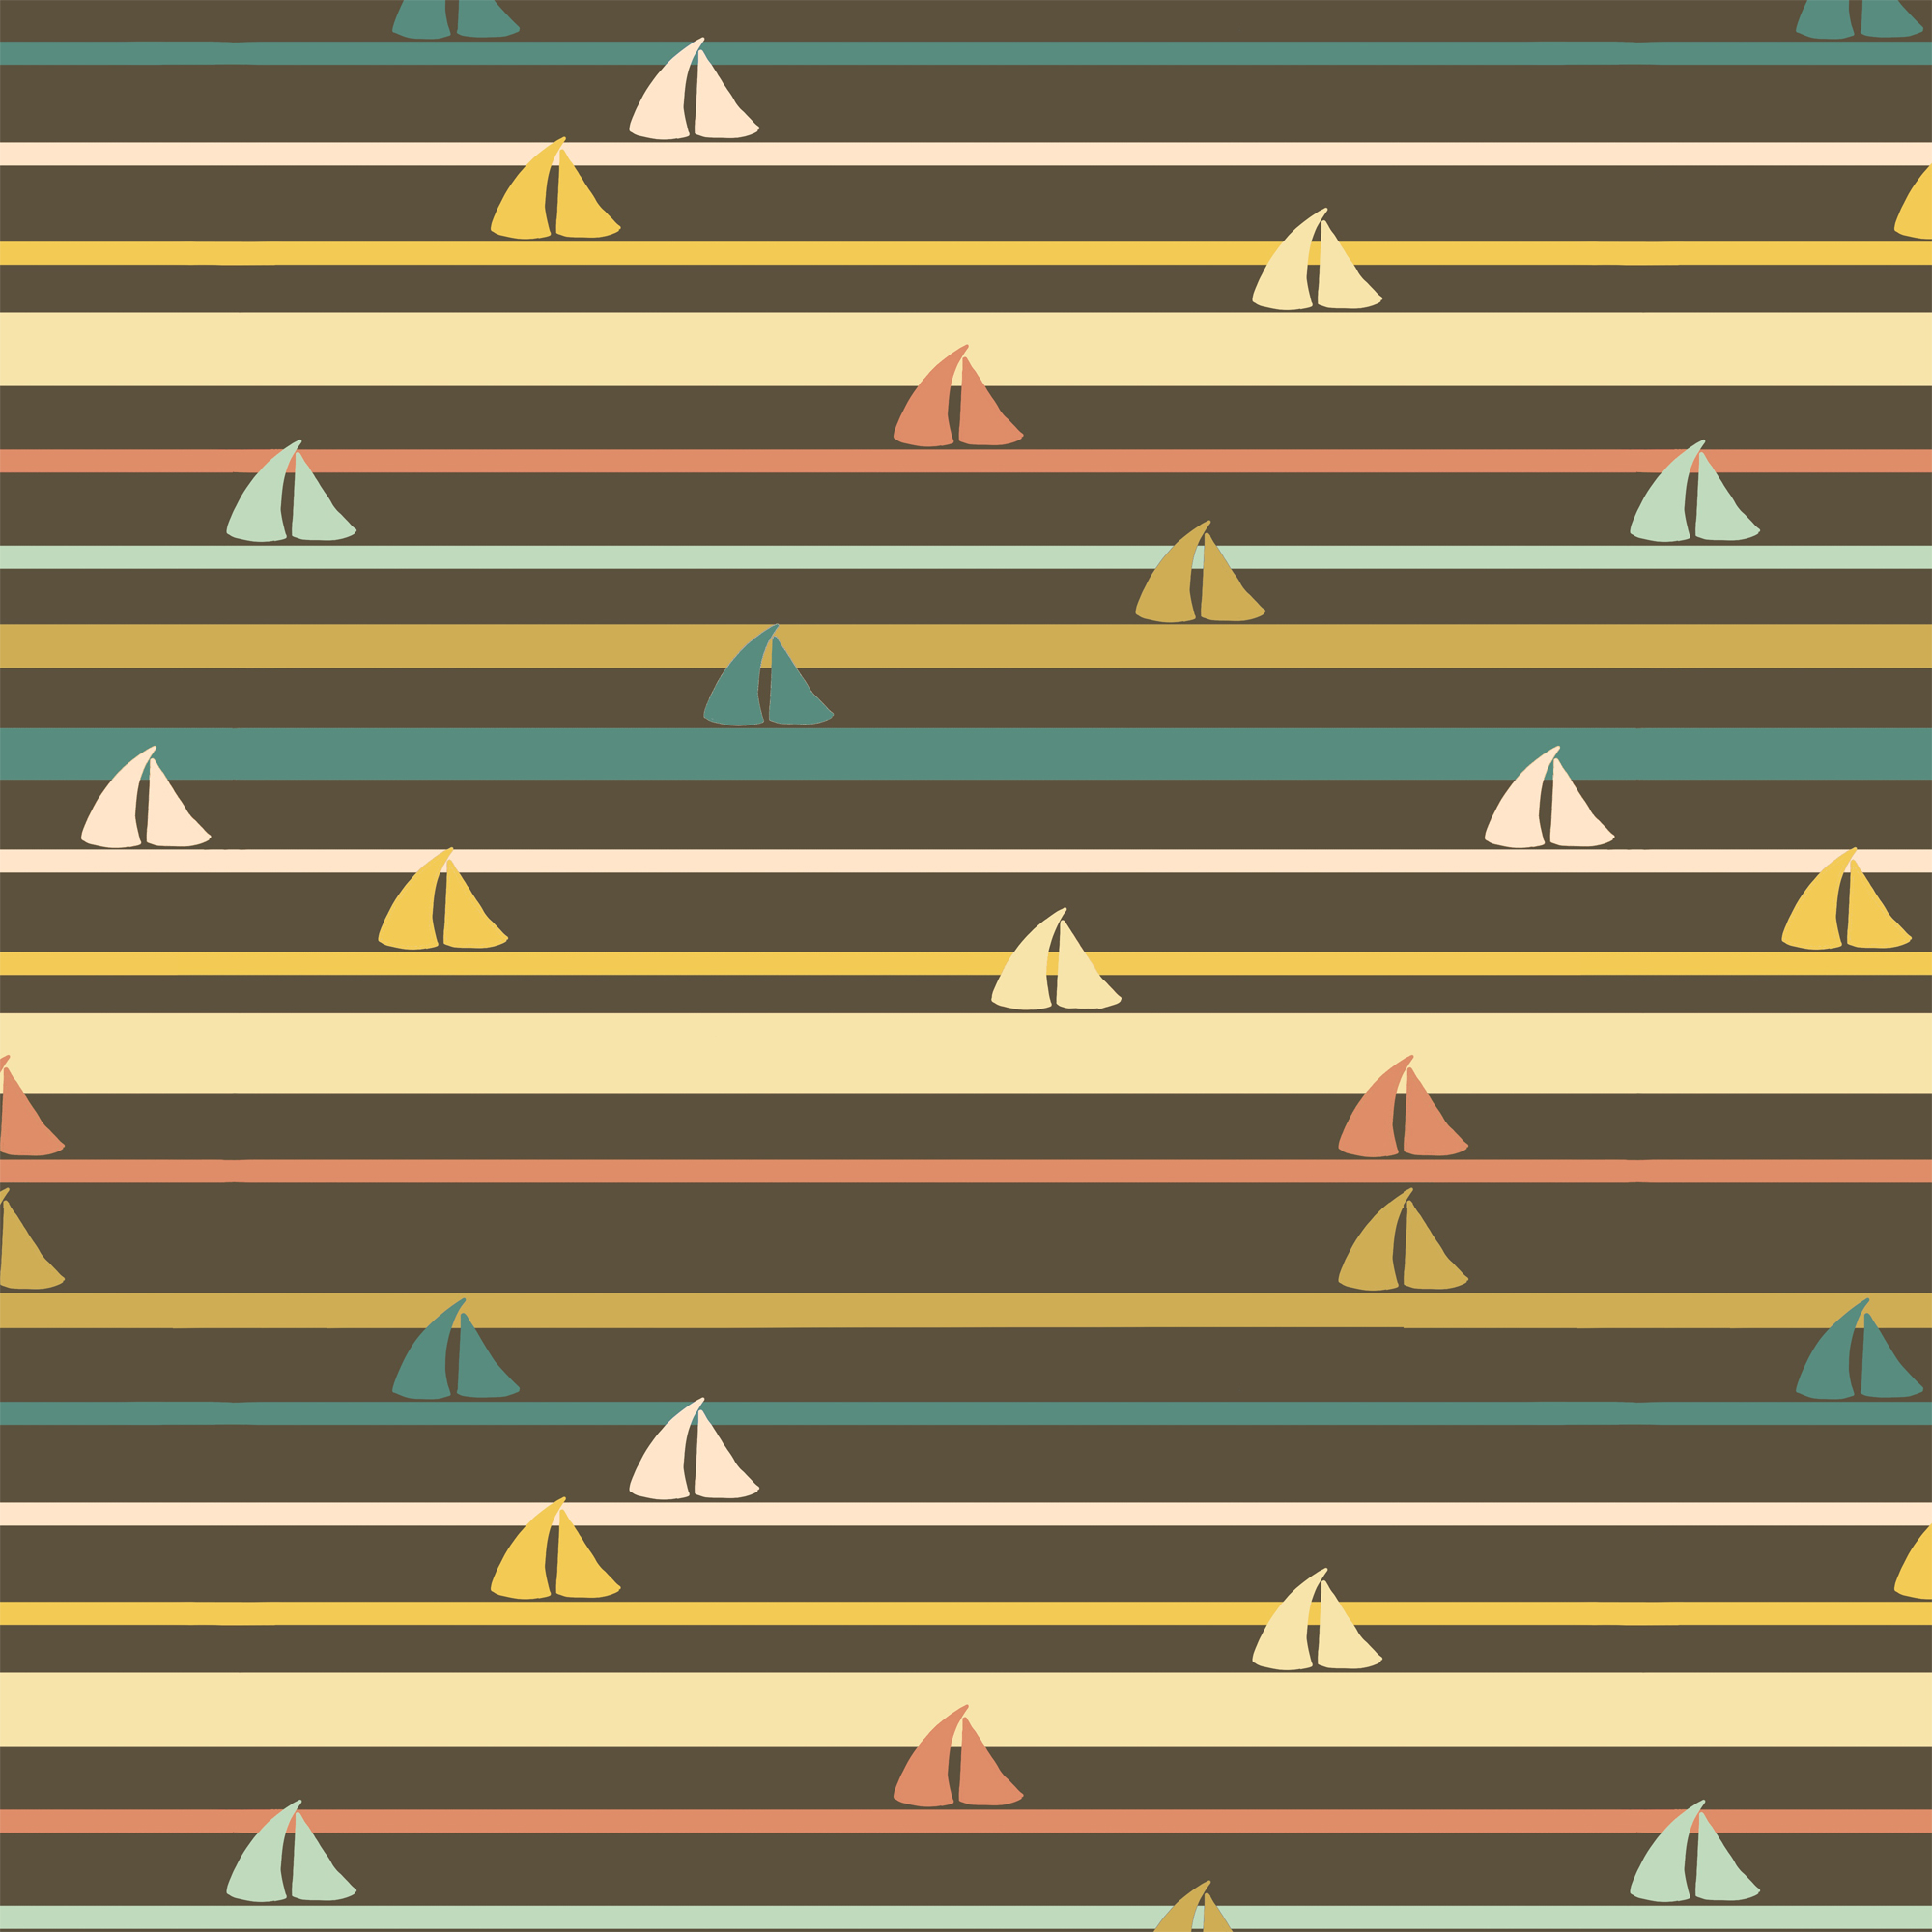 stripy boats_edited-1.jpg